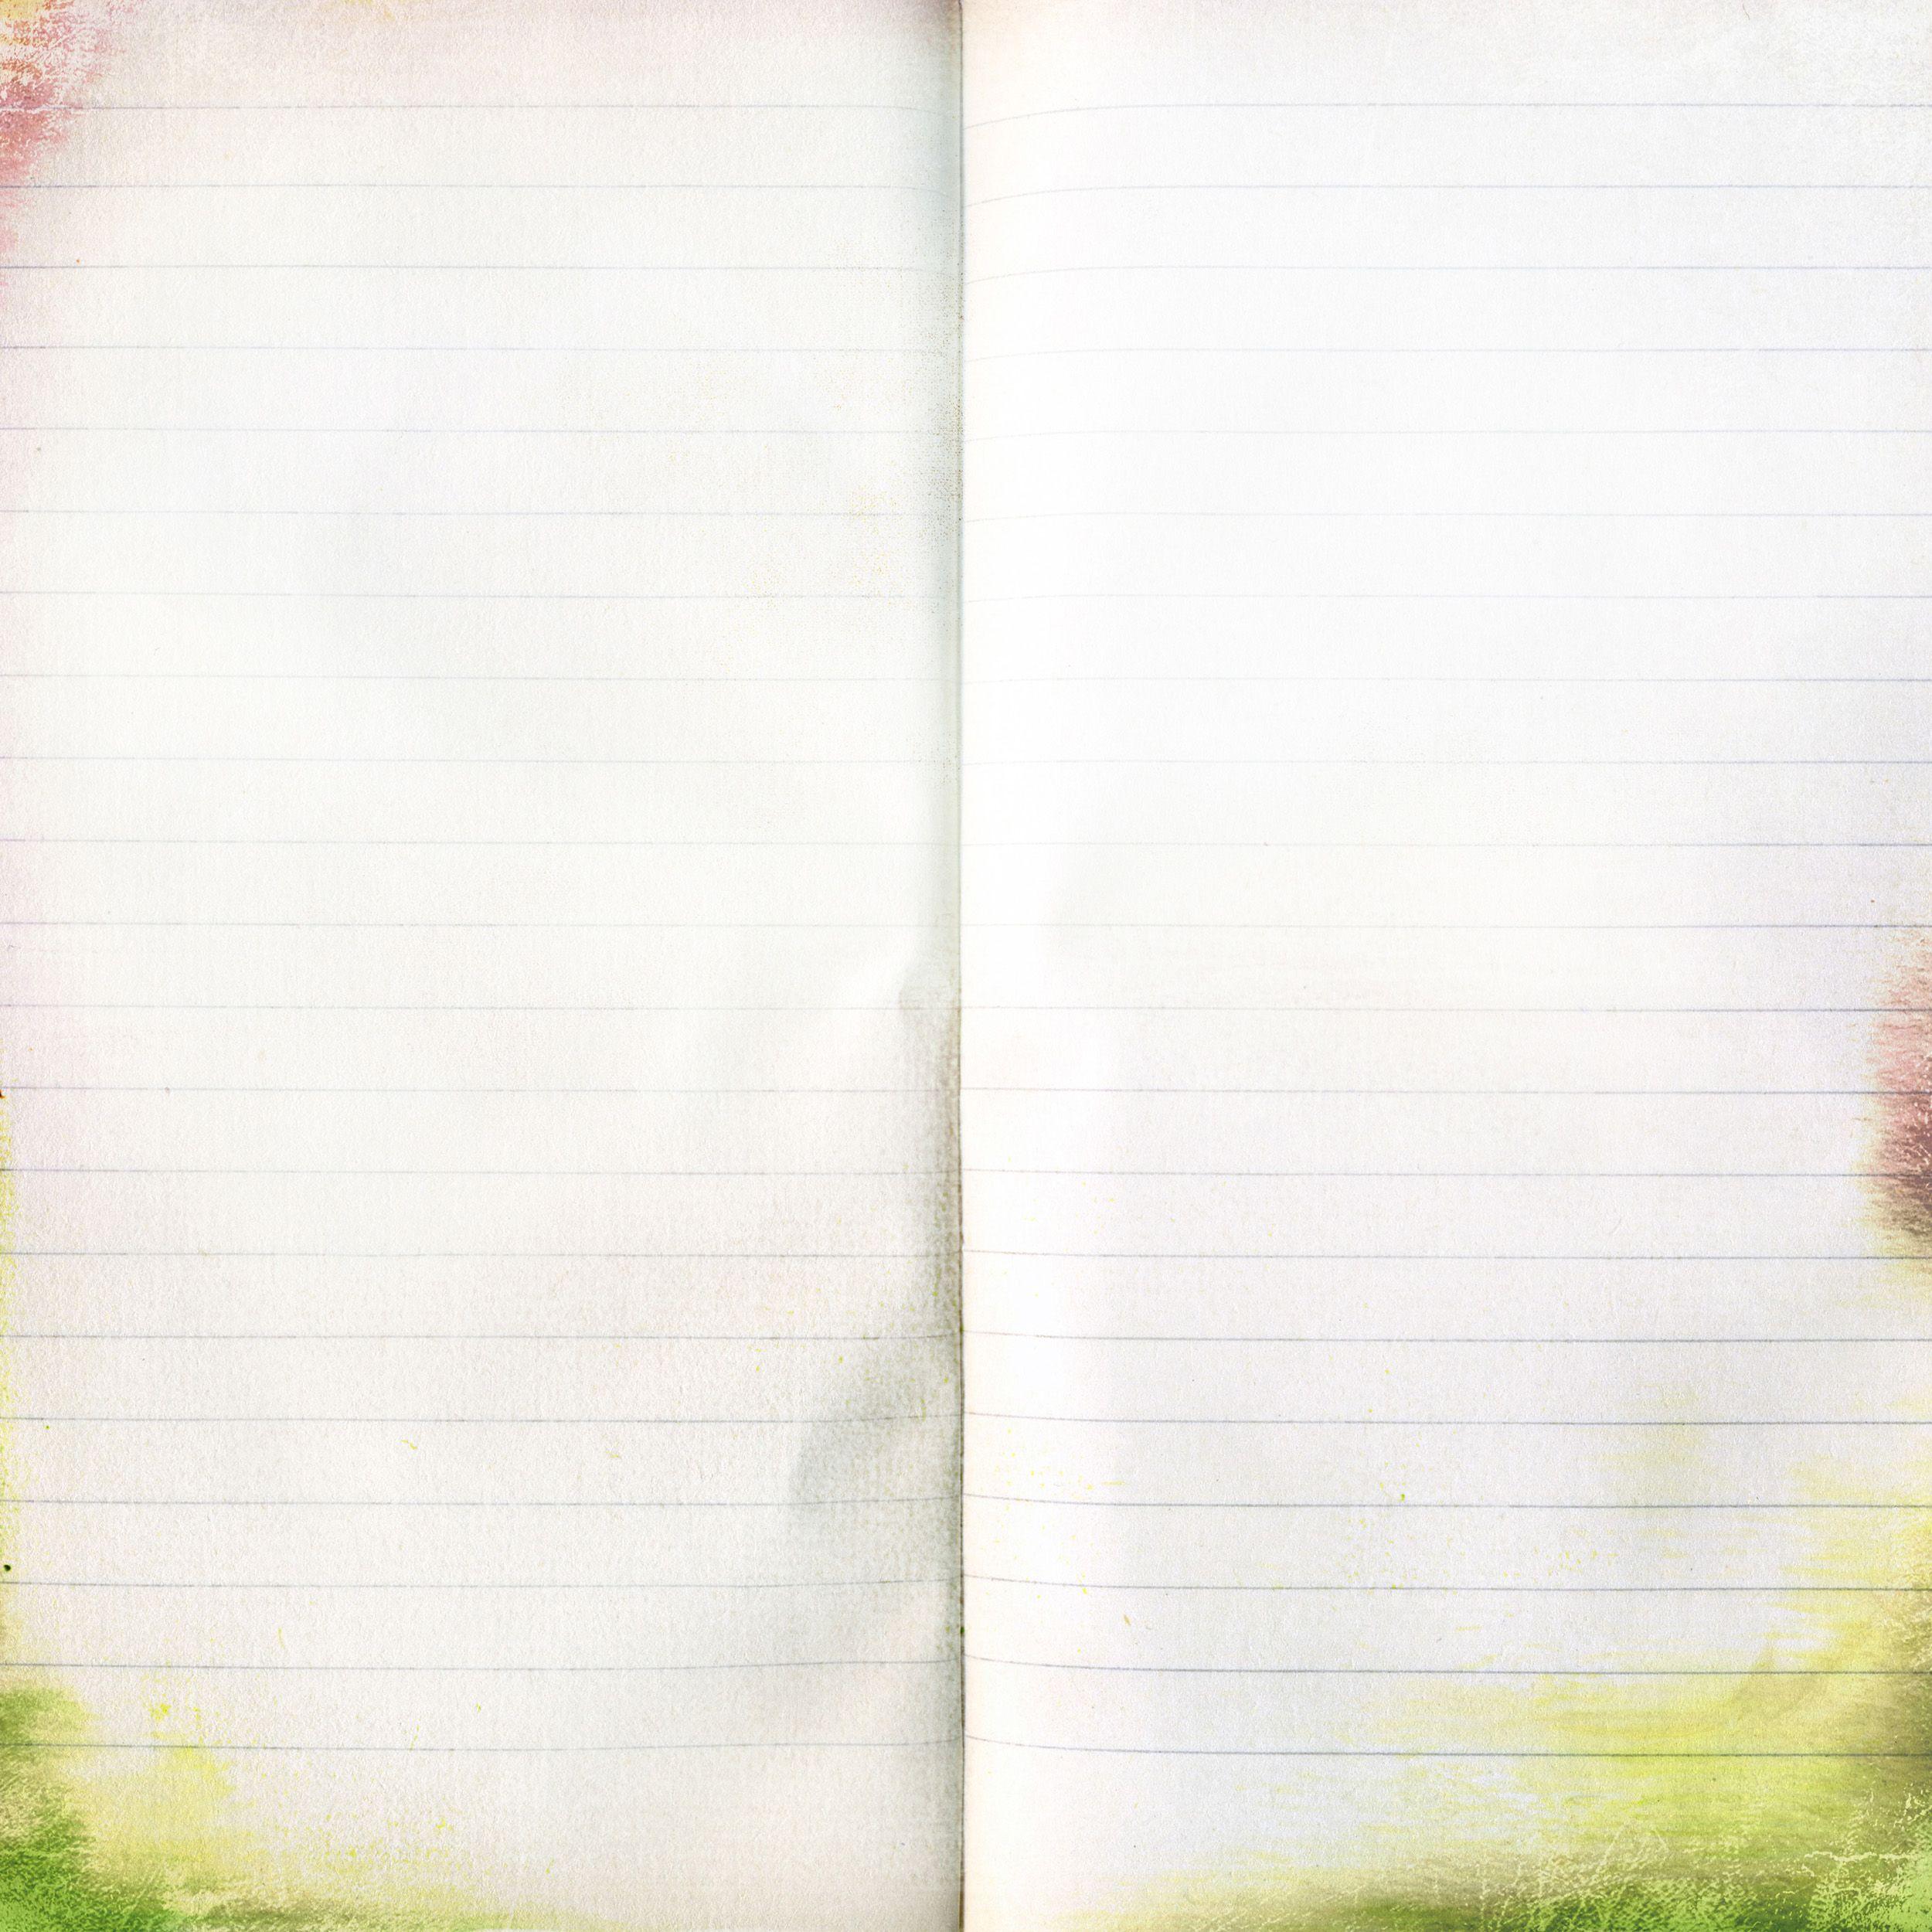 текстура тетрадный лист: